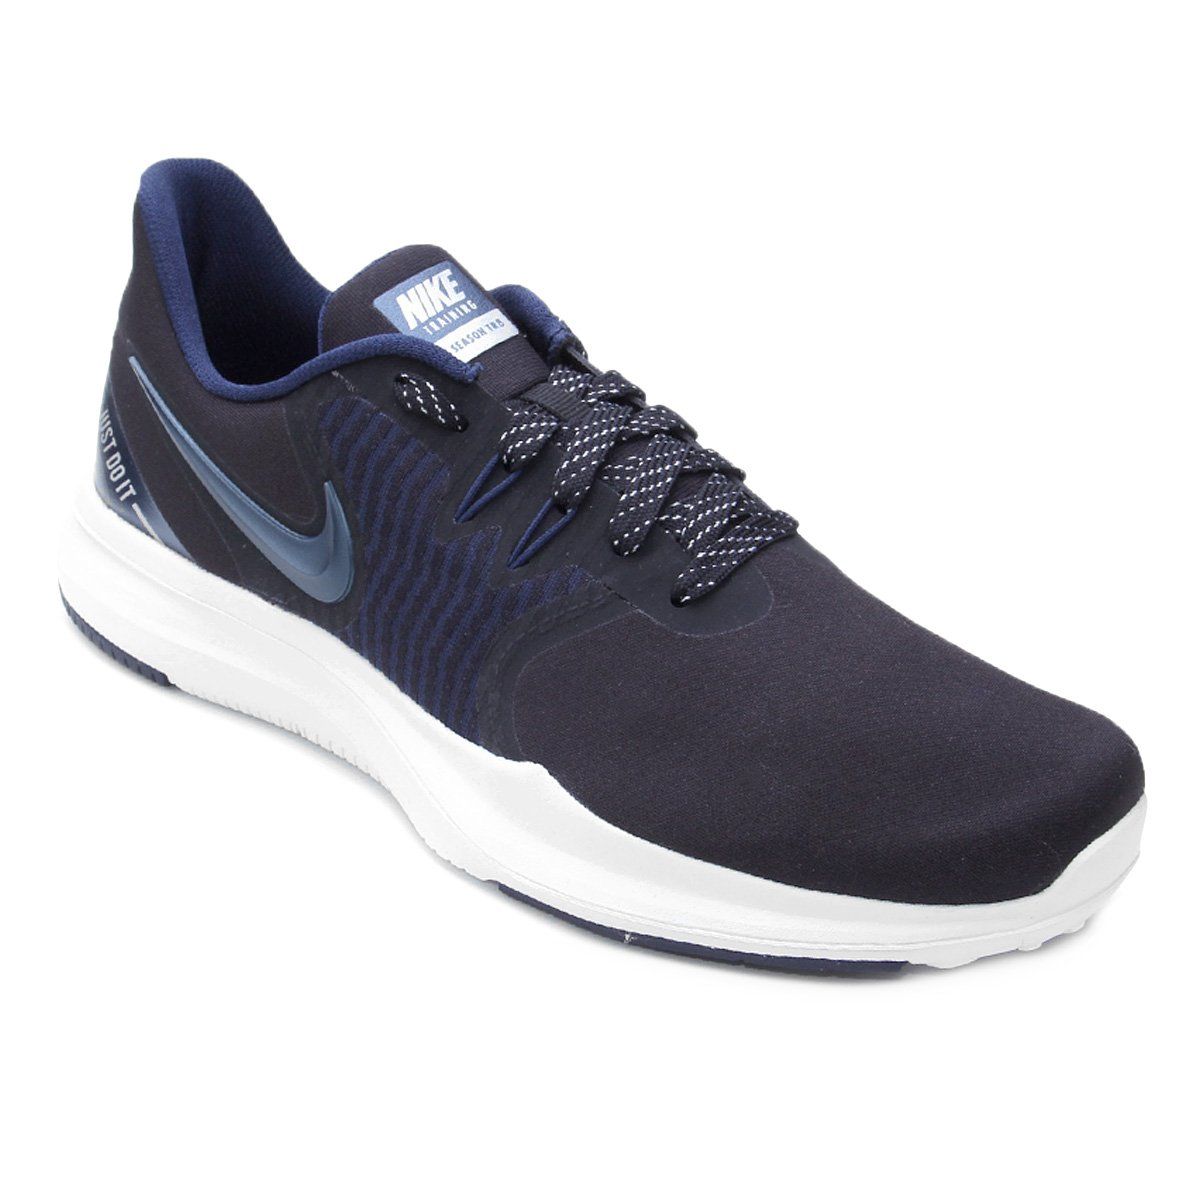 65780c8e7a6 Tênis Nike In-Season Tr 8 Prm Feminino - Preto e Azul - Compre Agora ...